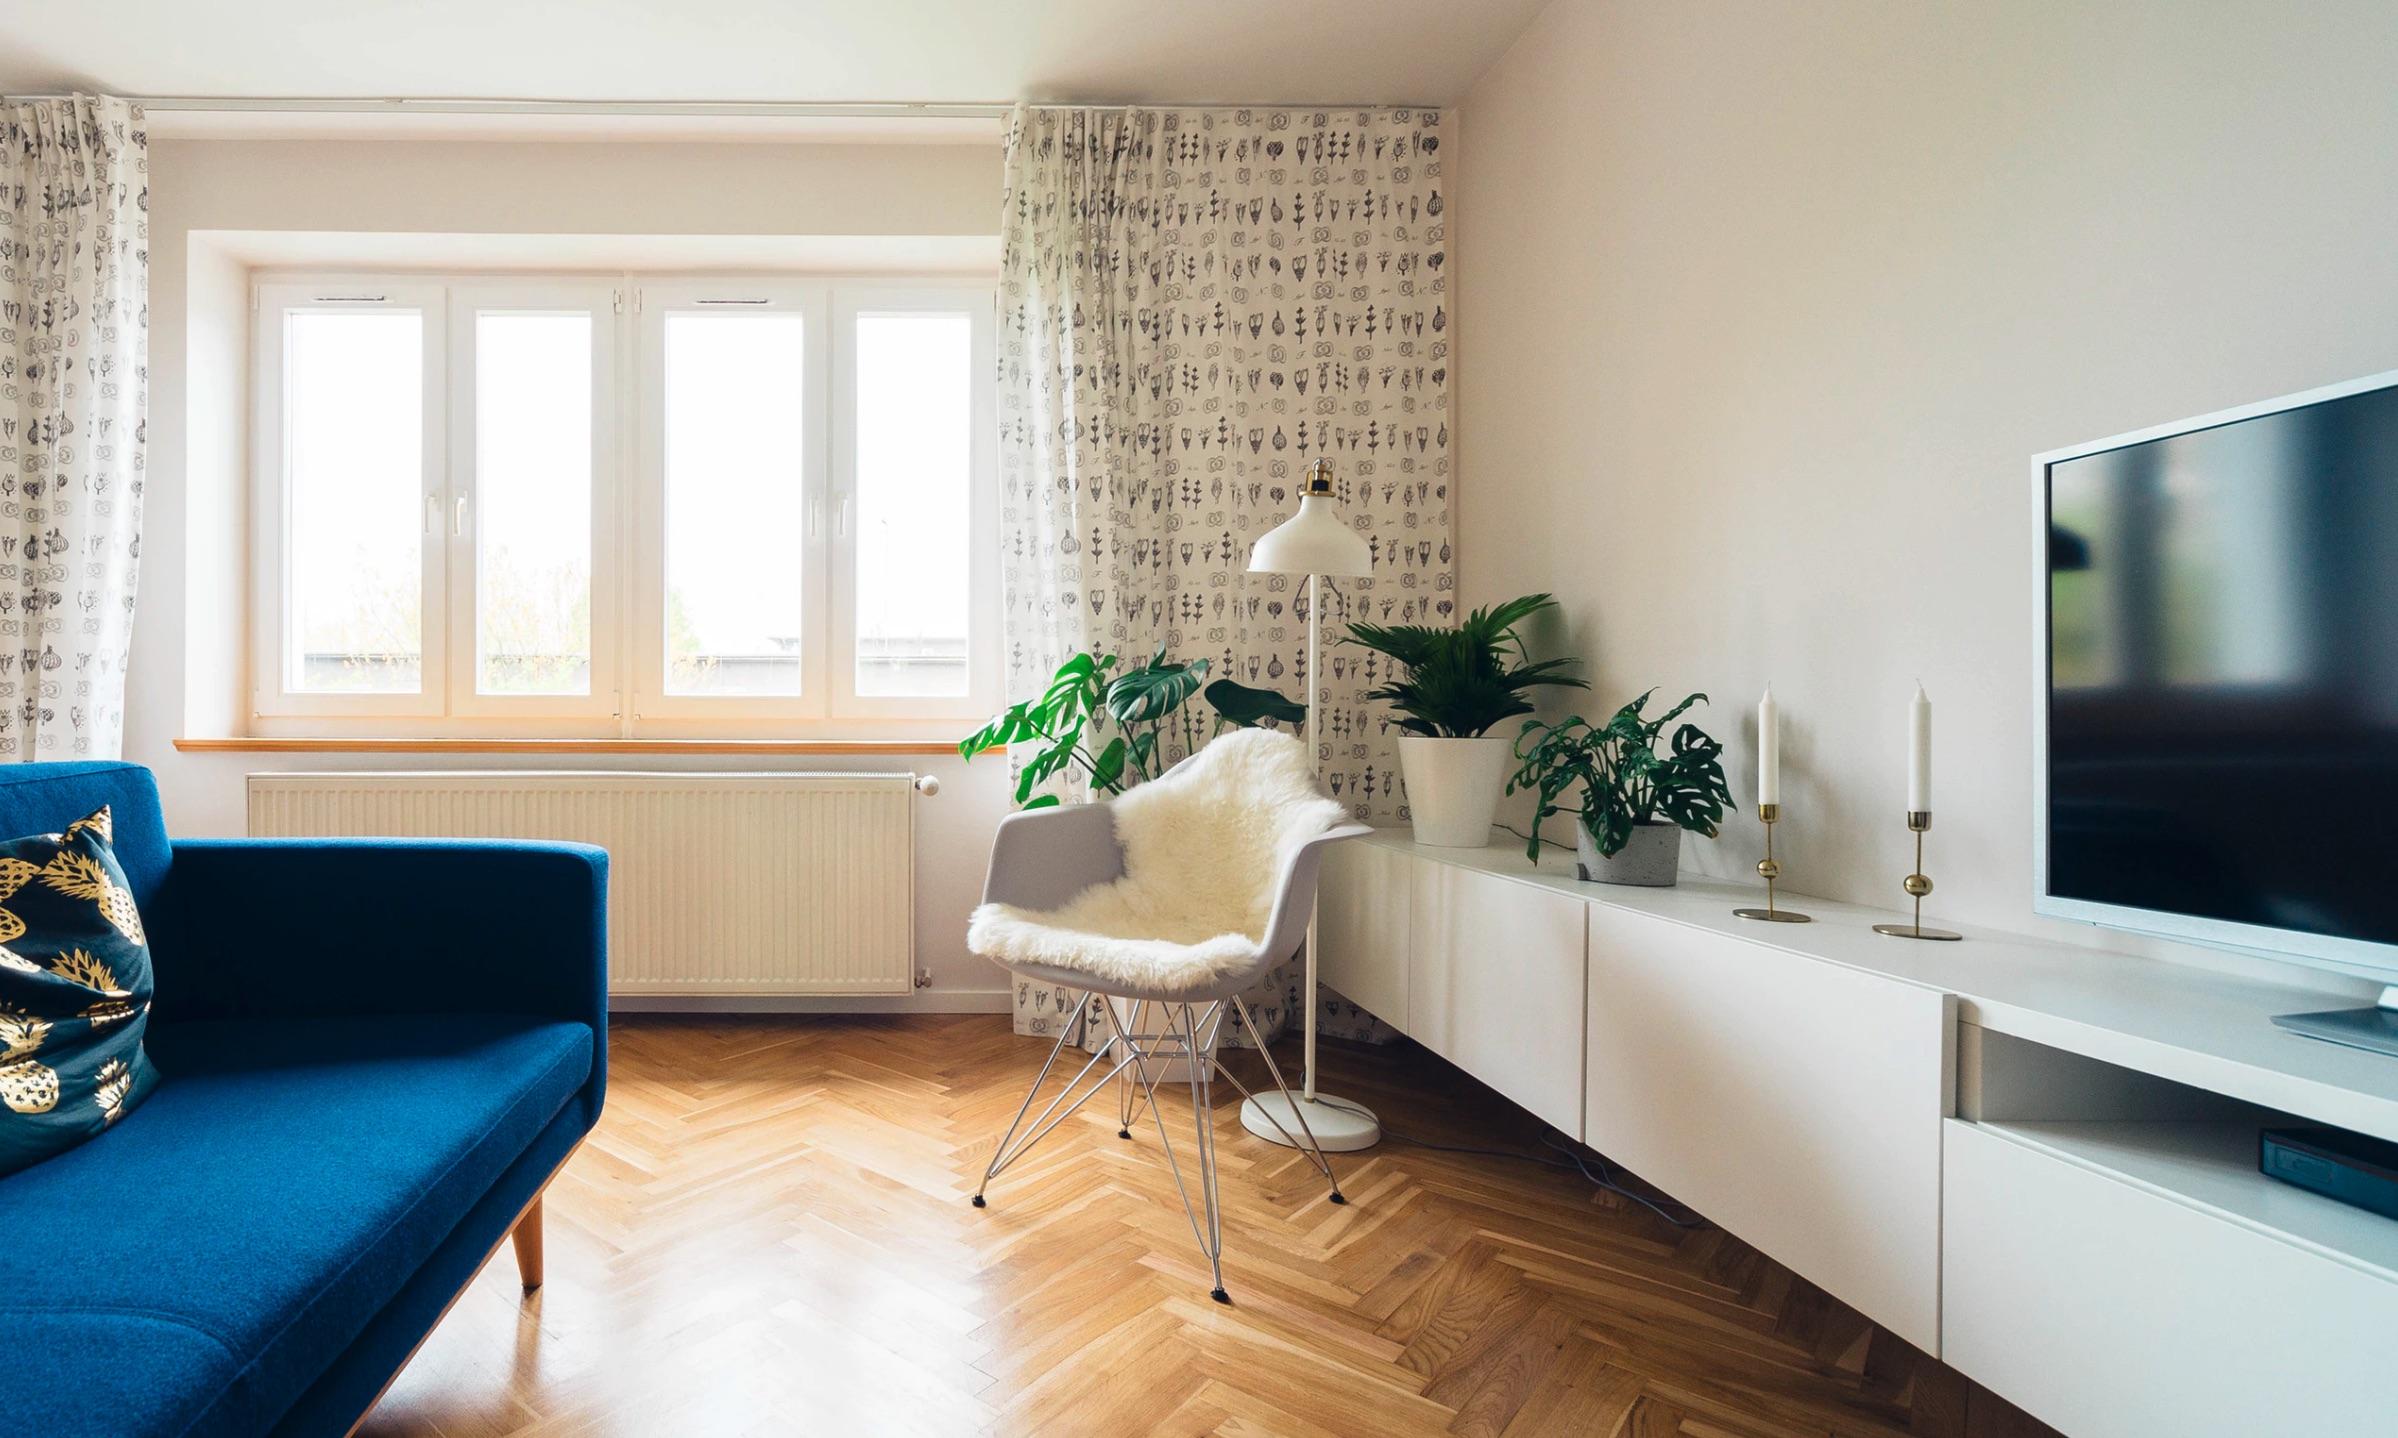 Liste der besten Immobilienmakler in Halle (Saale)